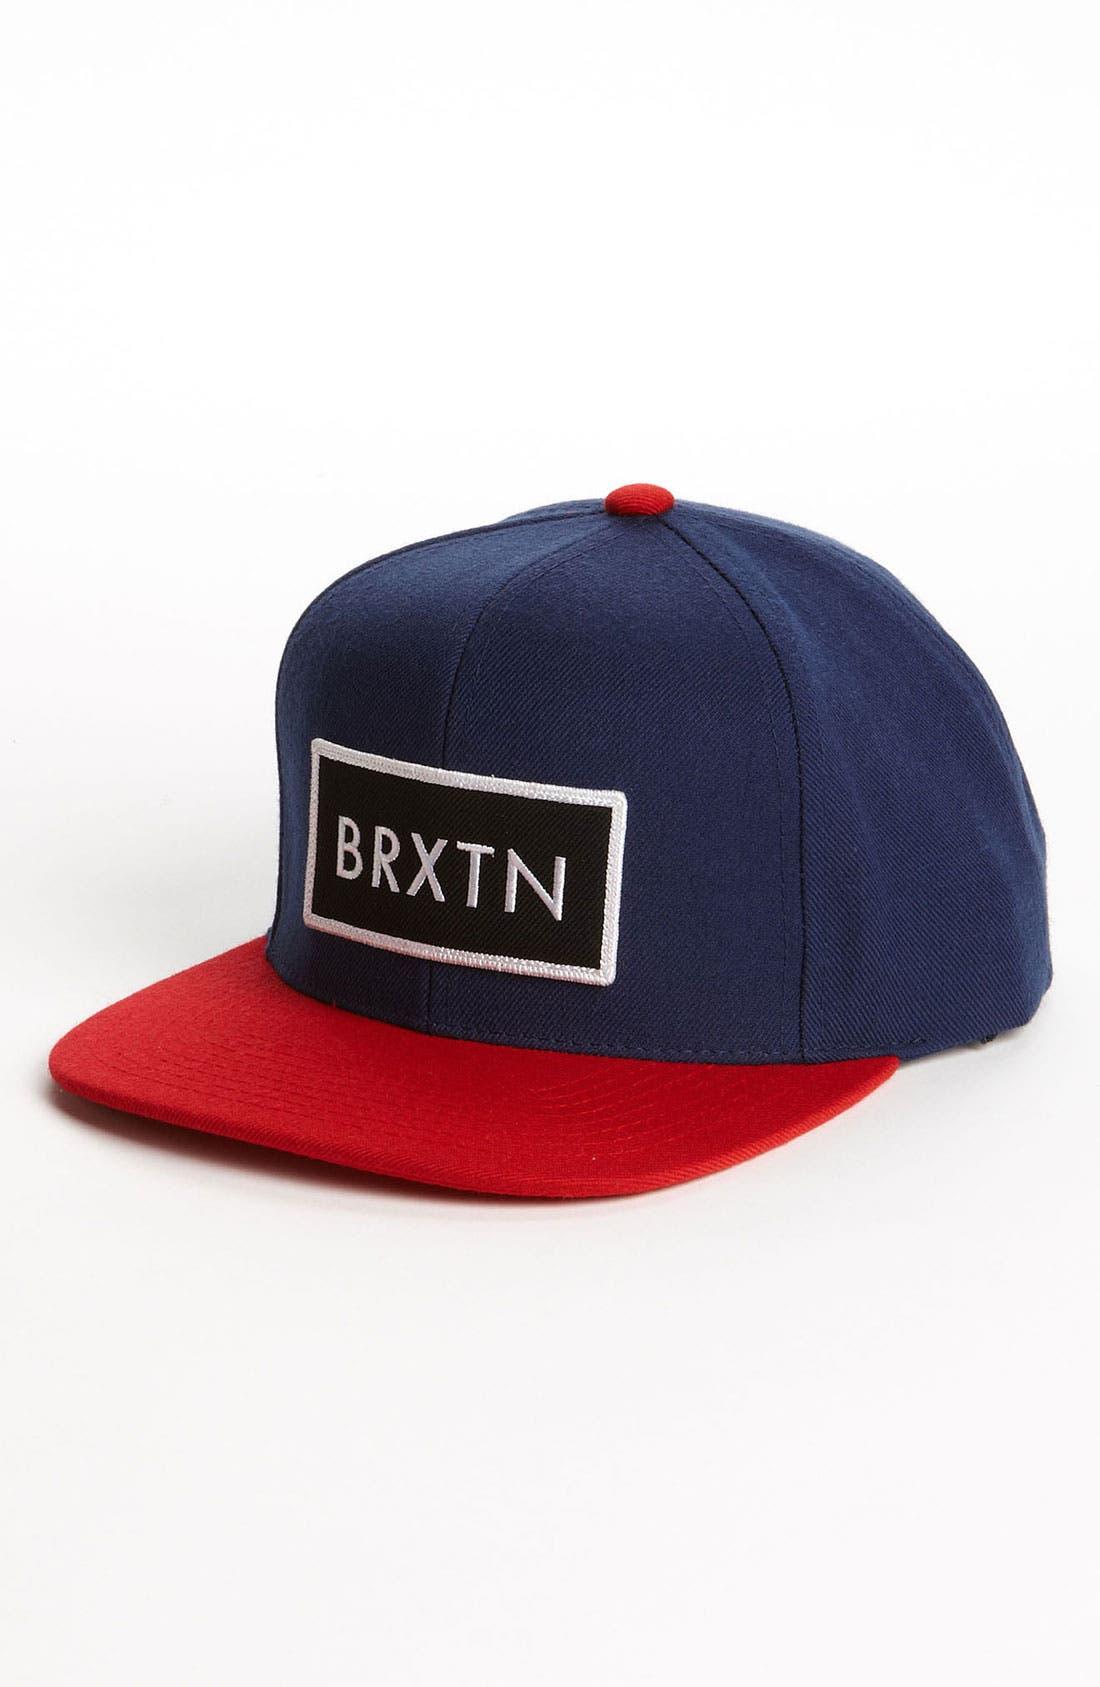 Main Image - Brixton 'Rift' Snapback Baseball Cap